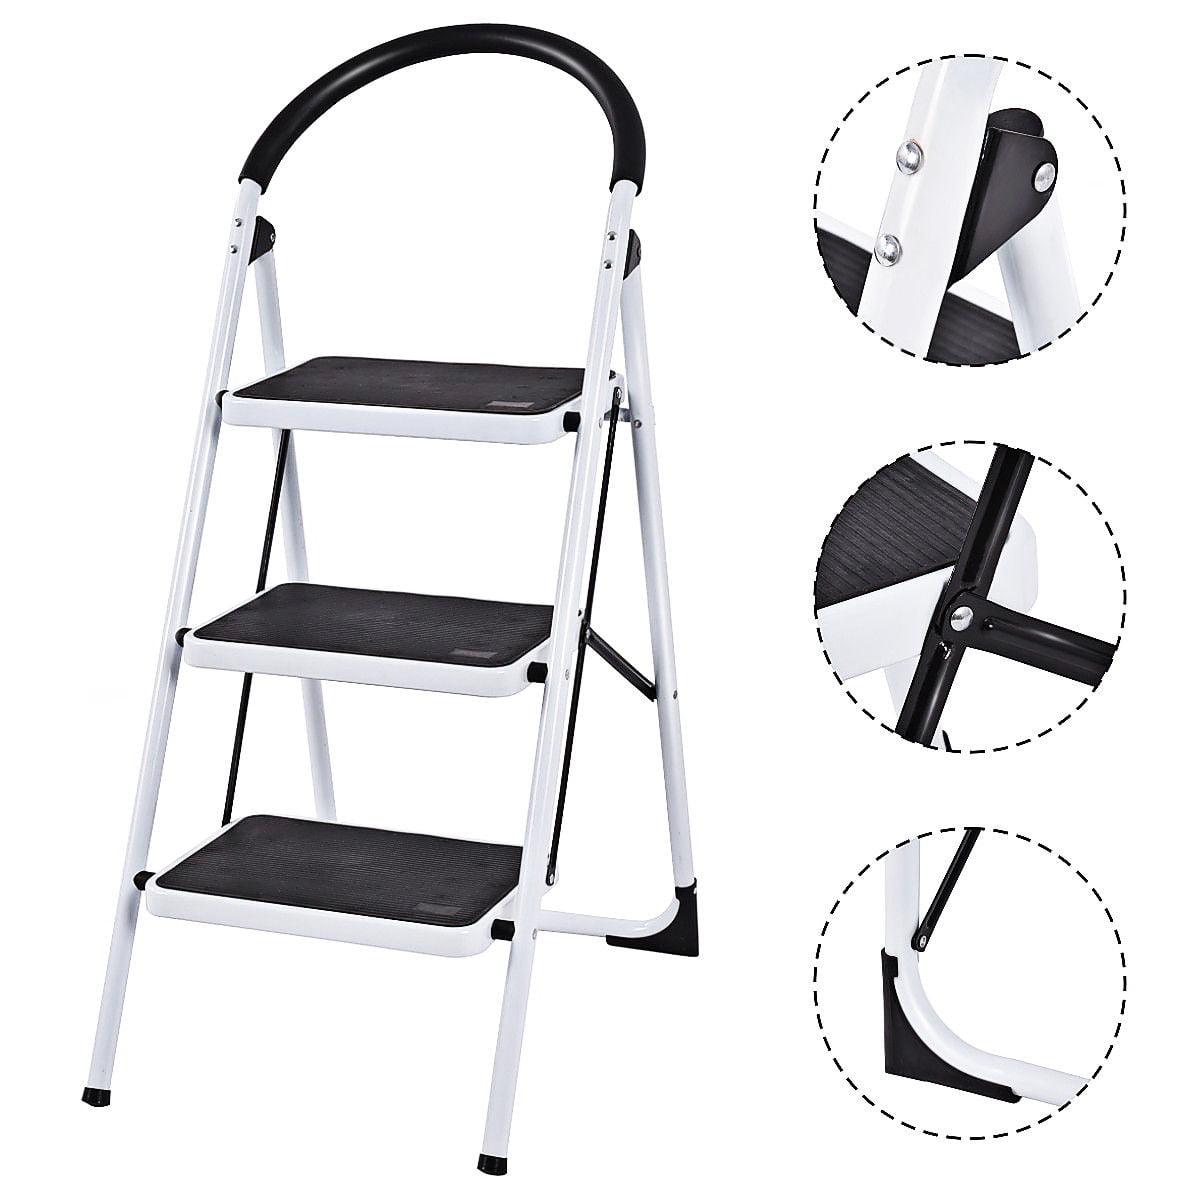 Tremendous 3 Step Ladder Folding Stool Heavy Duty Industrial Lightweight 330Lbs Capacity Machost Co Dining Chair Design Ideas Machostcouk